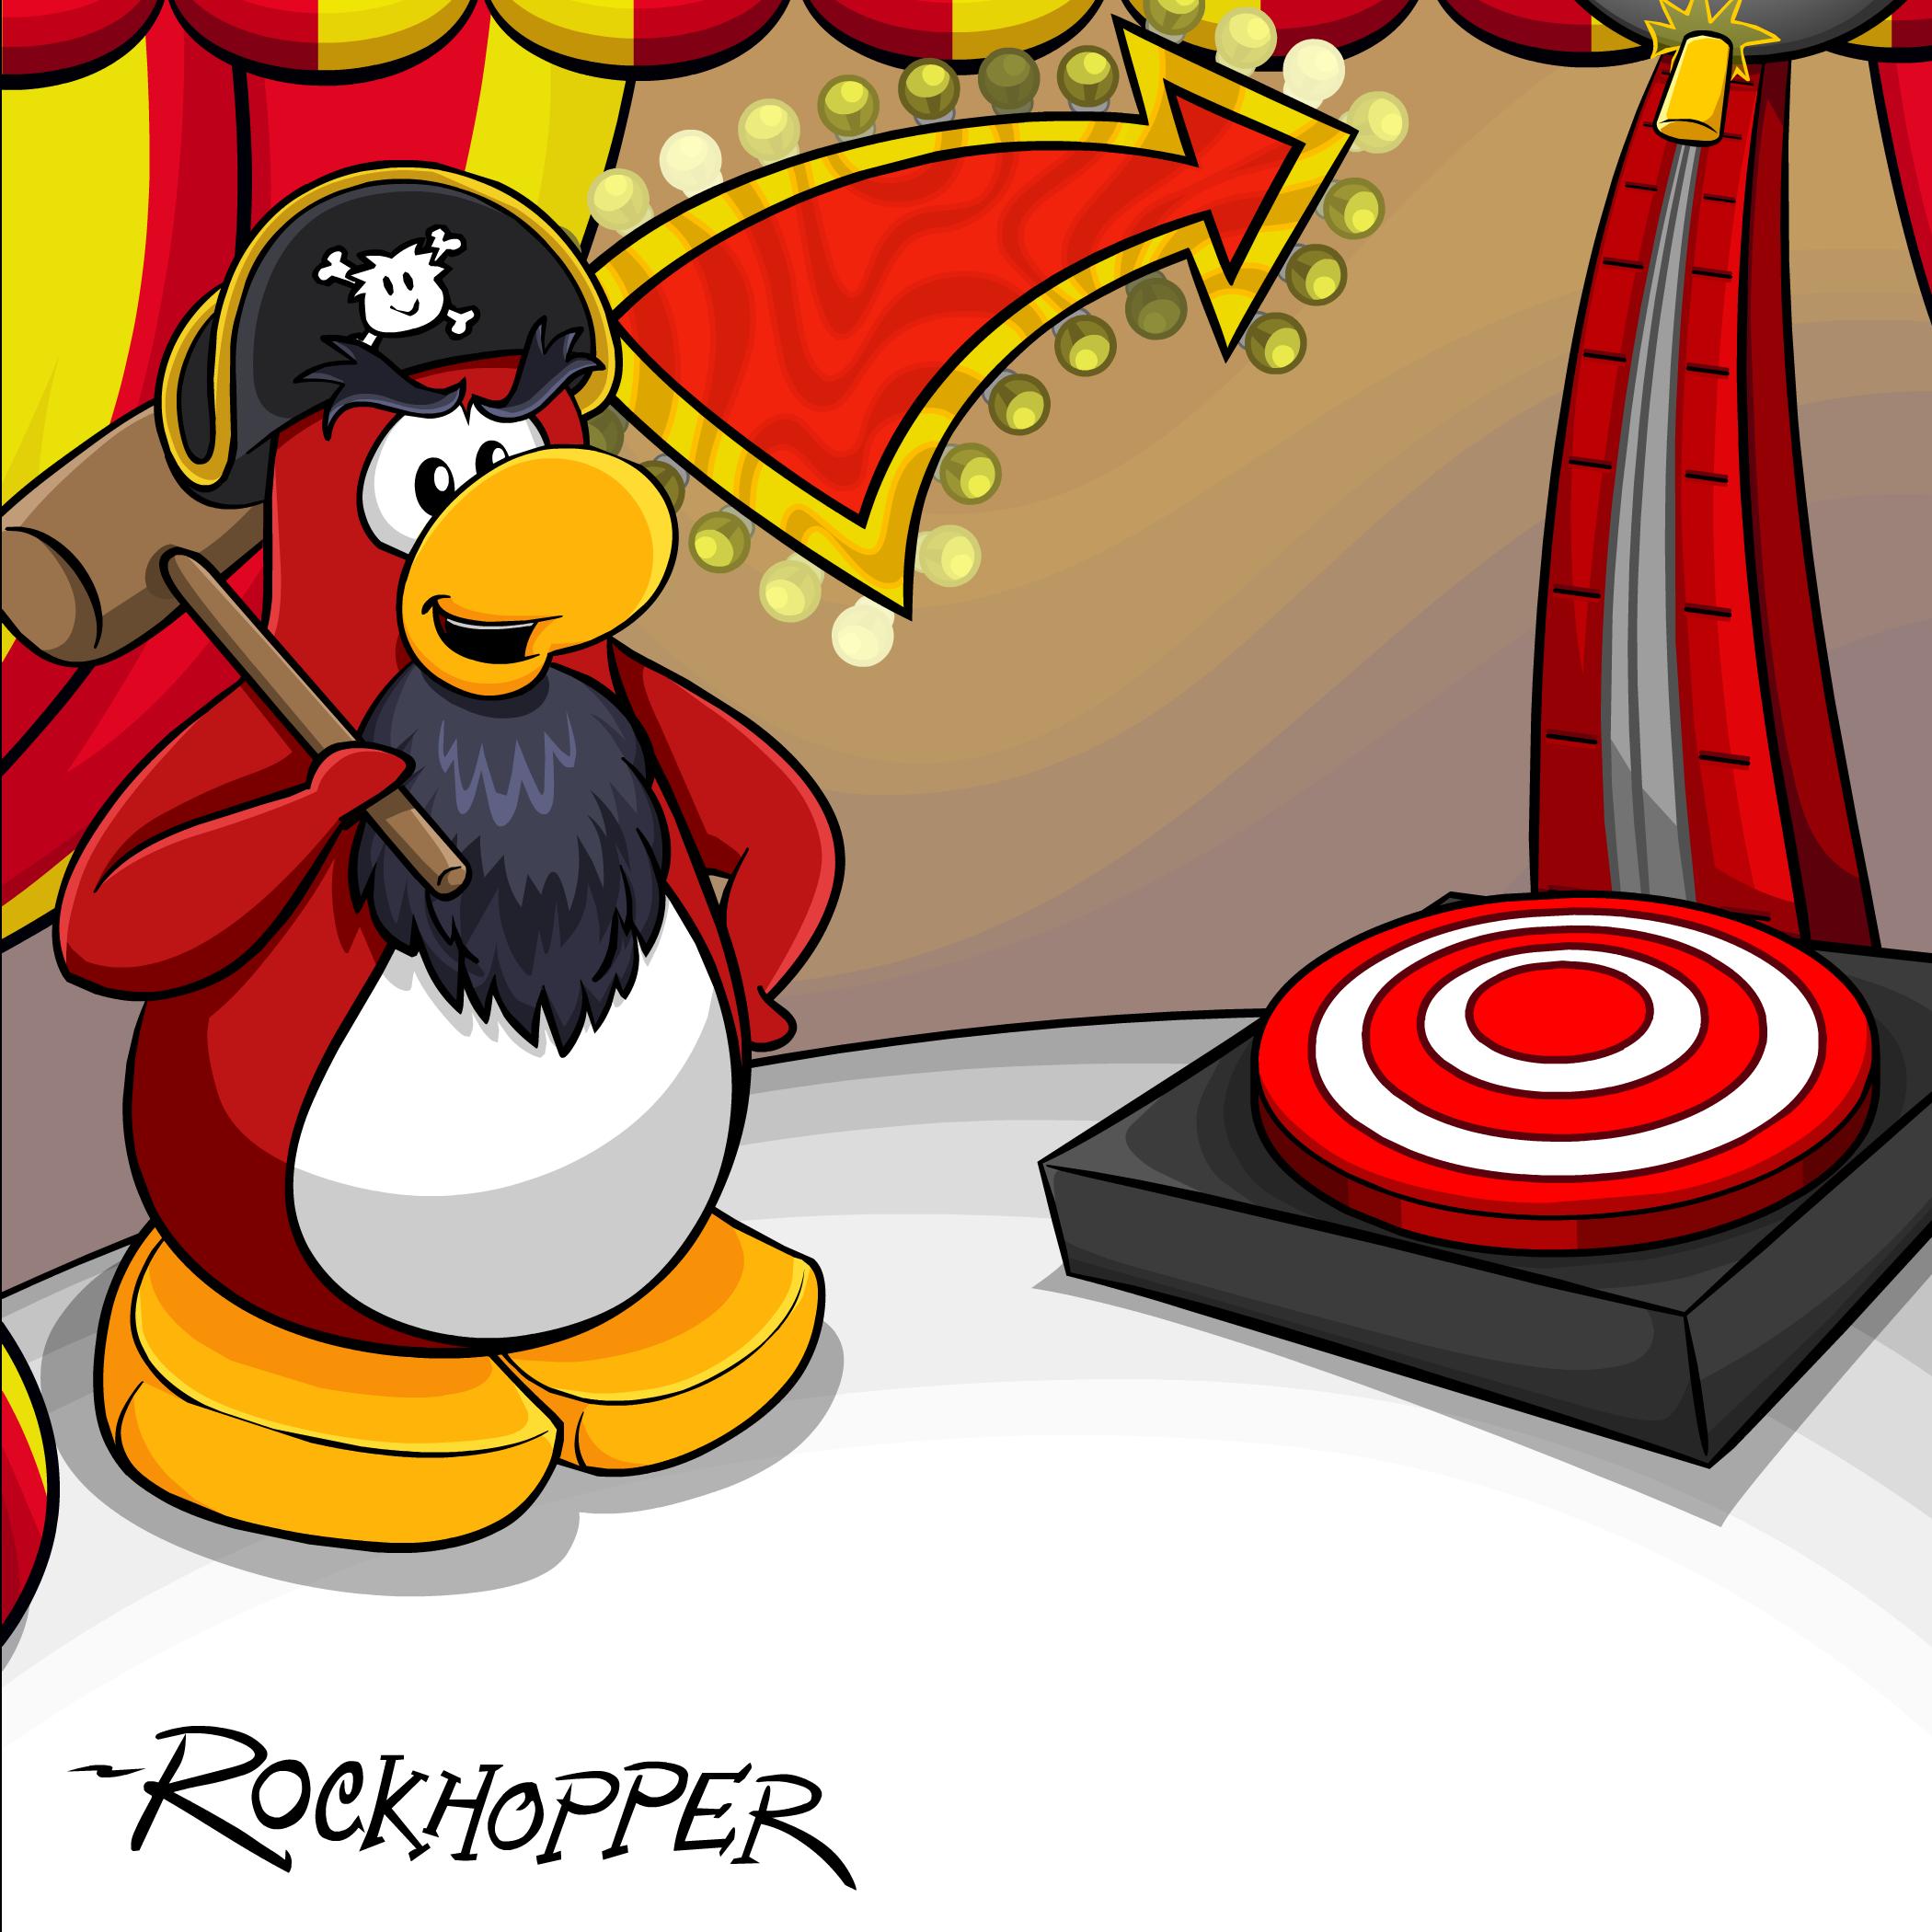 Rockhopper's Fair Giveaway